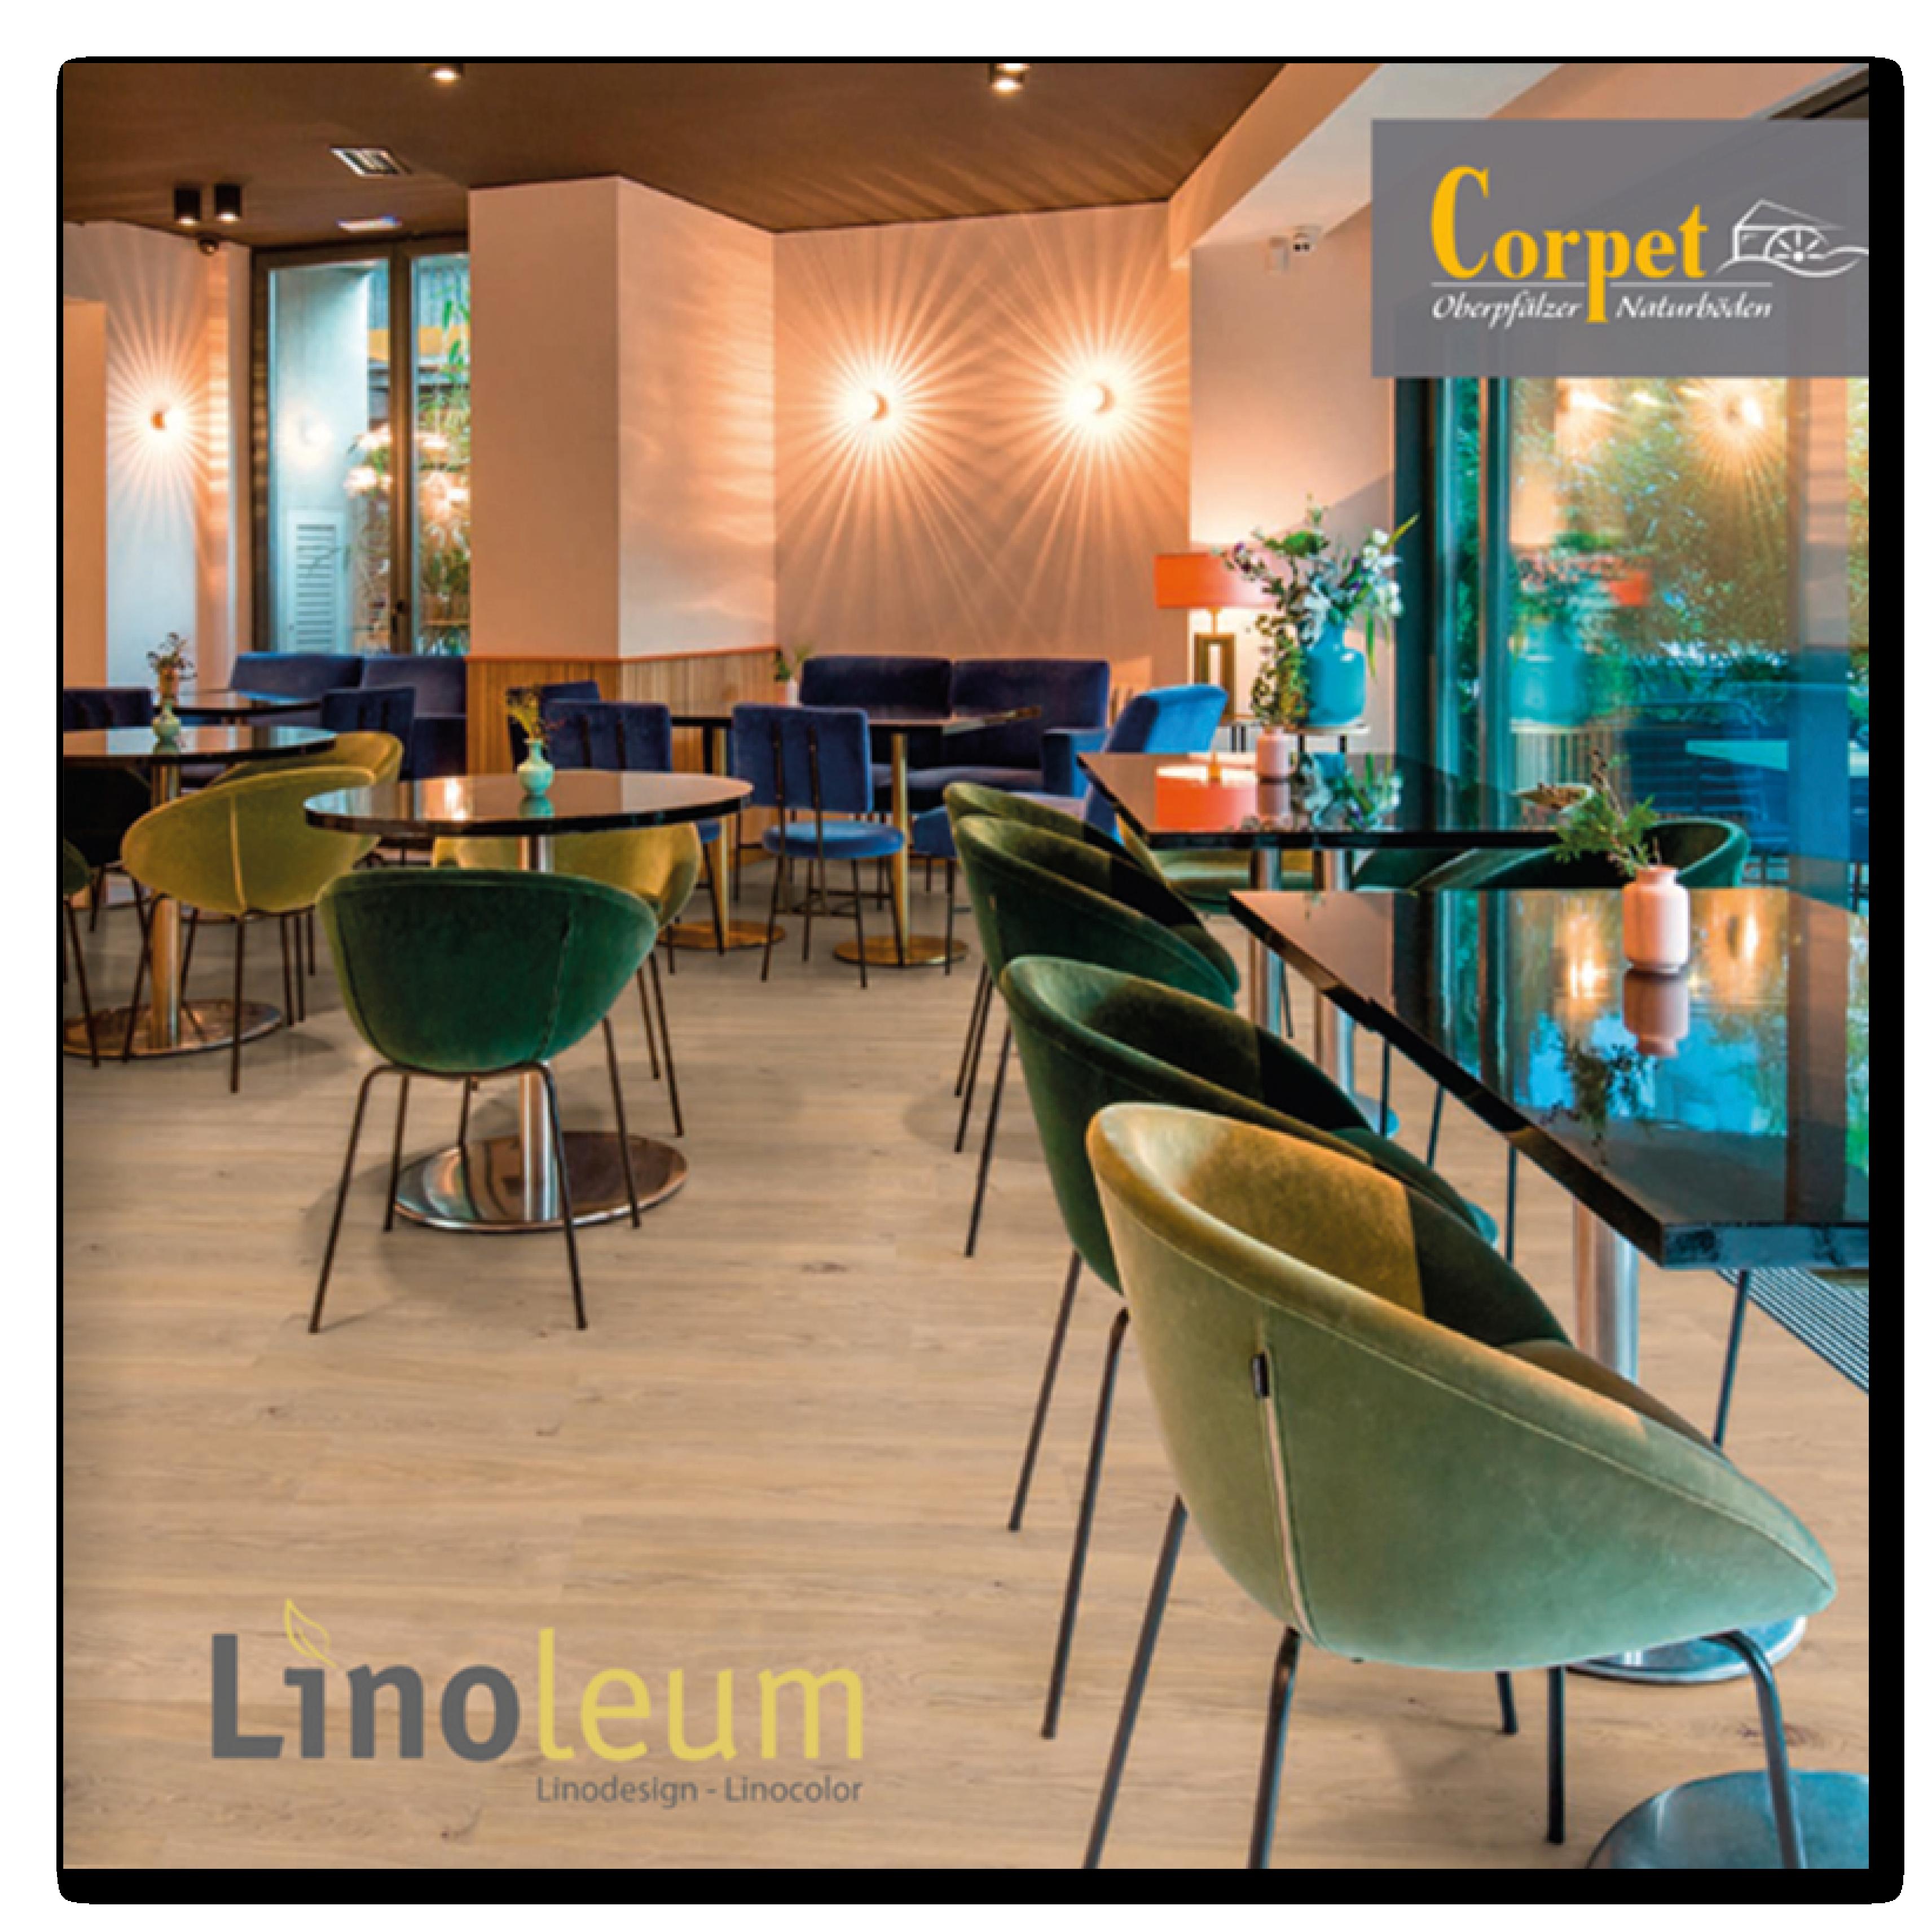 CC_Linoleum_Katalog